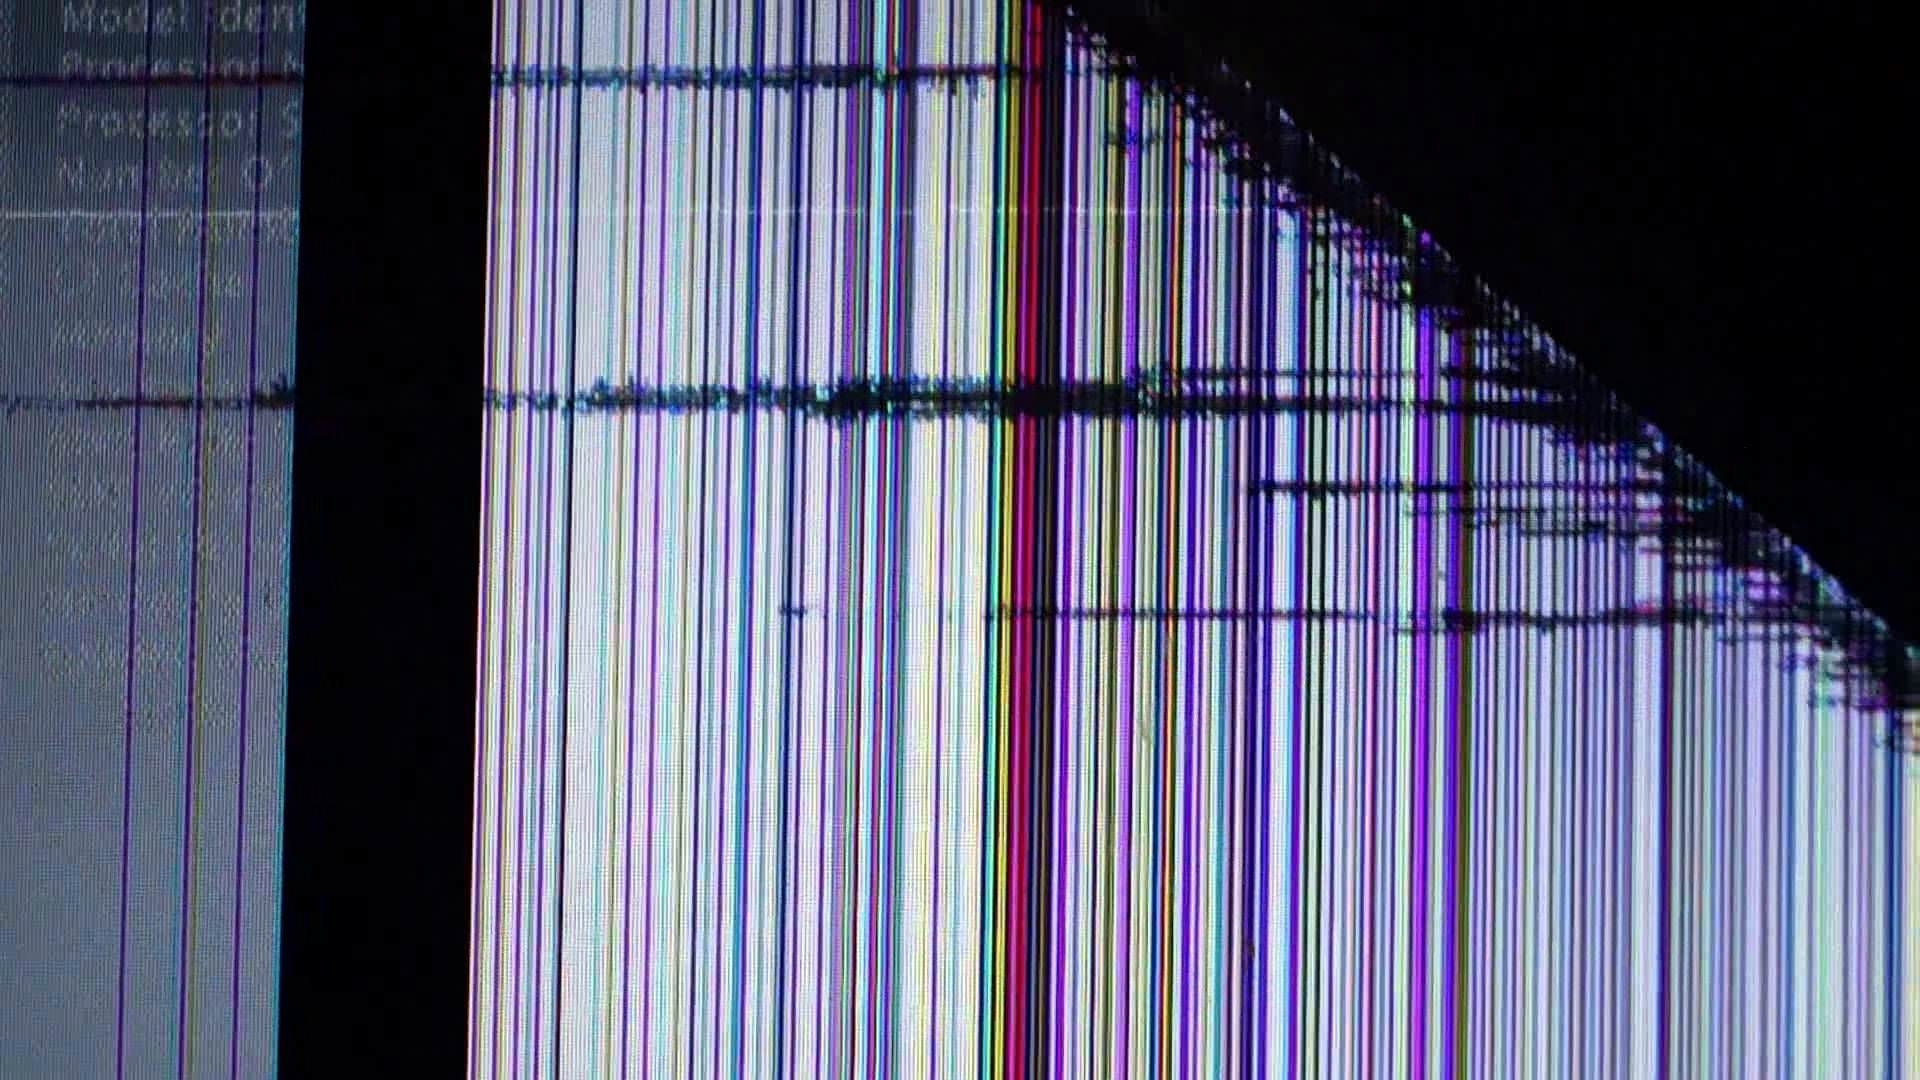 6 broken screen wallpaper prank for iphone, ipod, windows and mac laptop